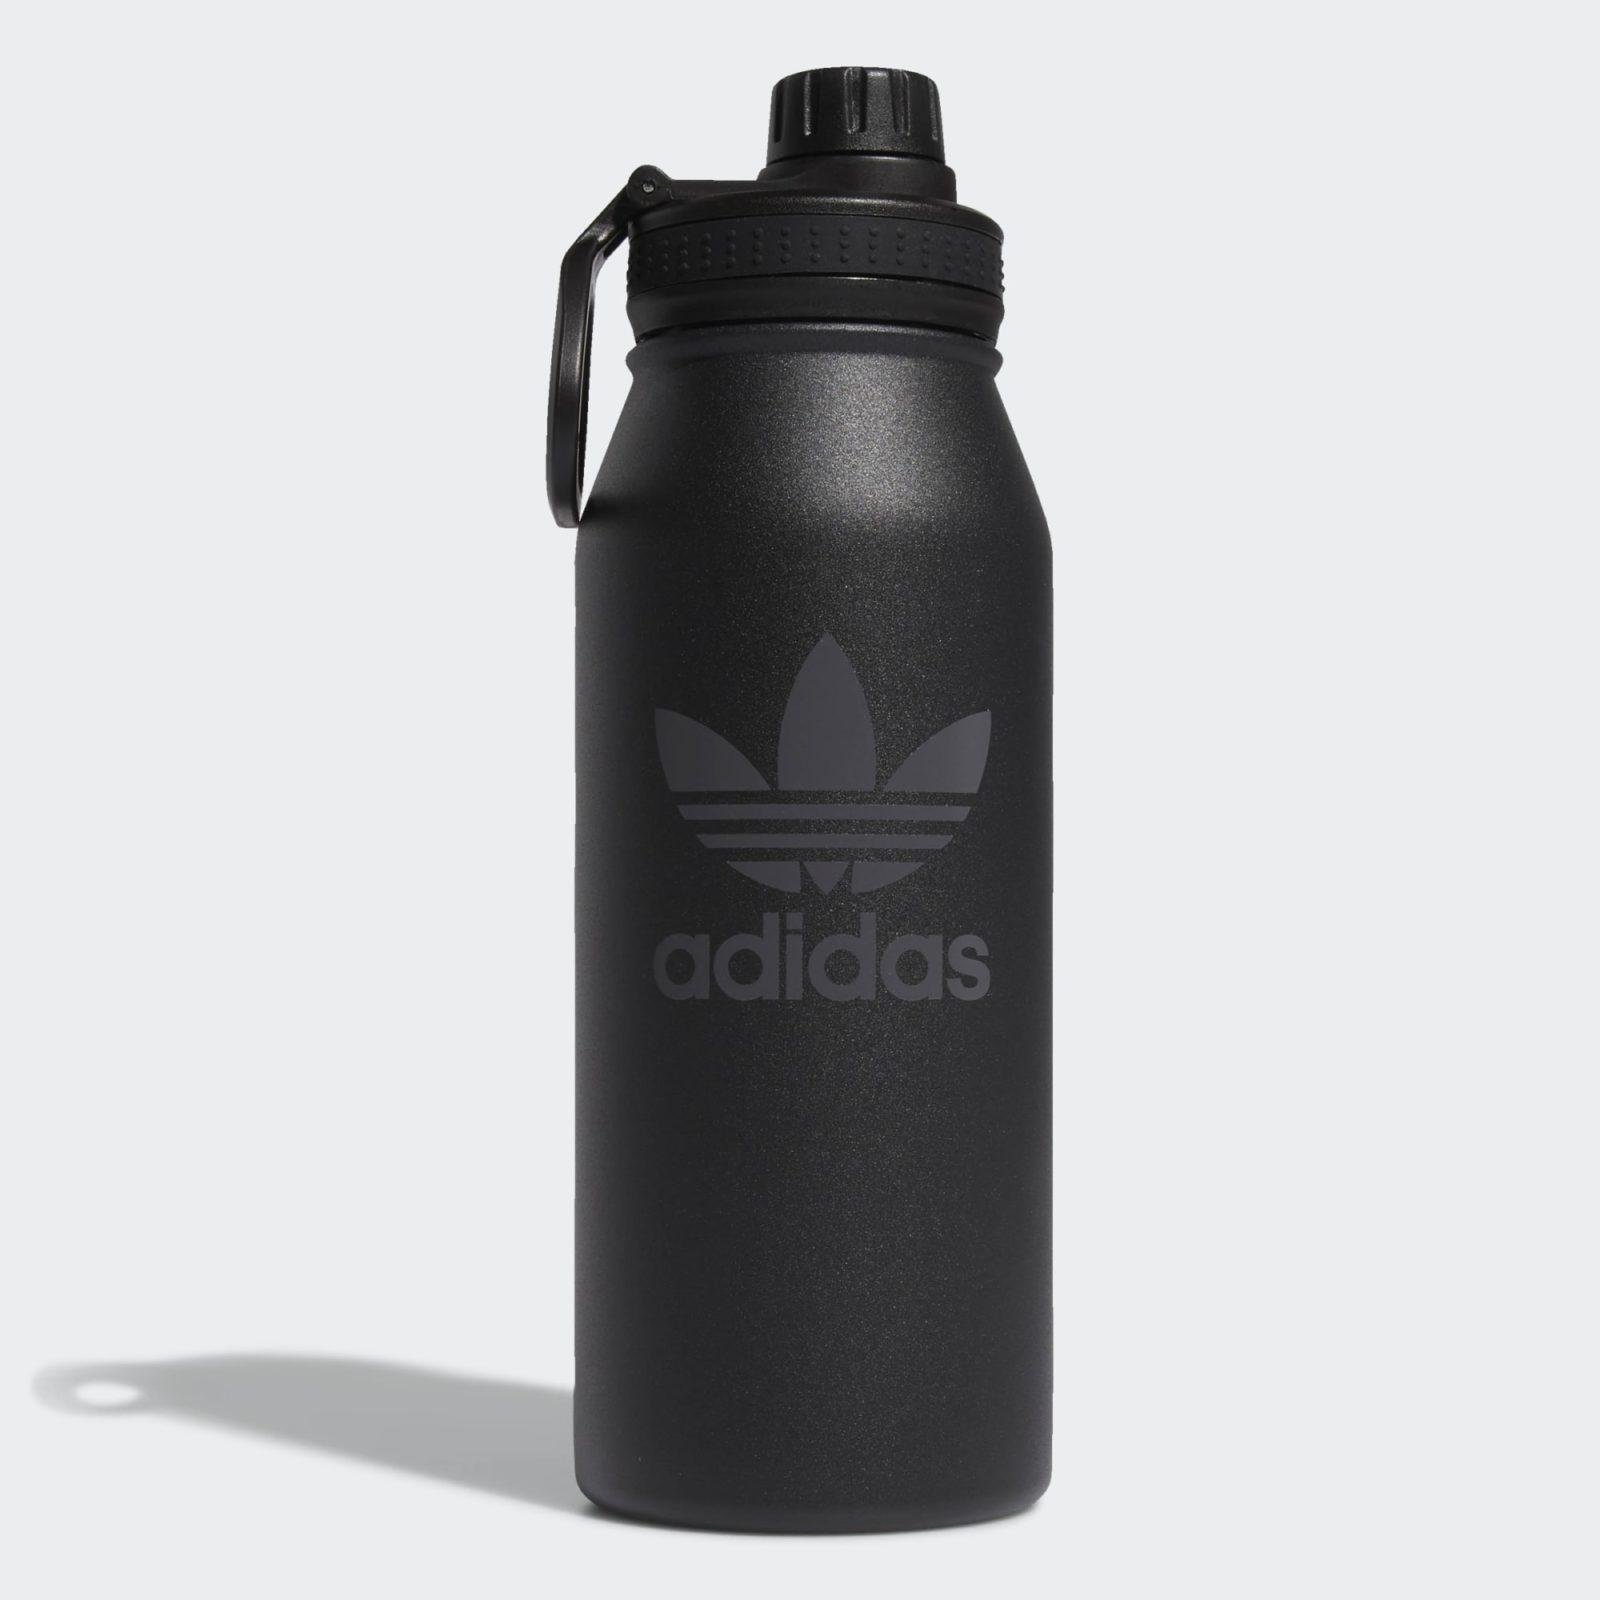 Adidas sale bottle